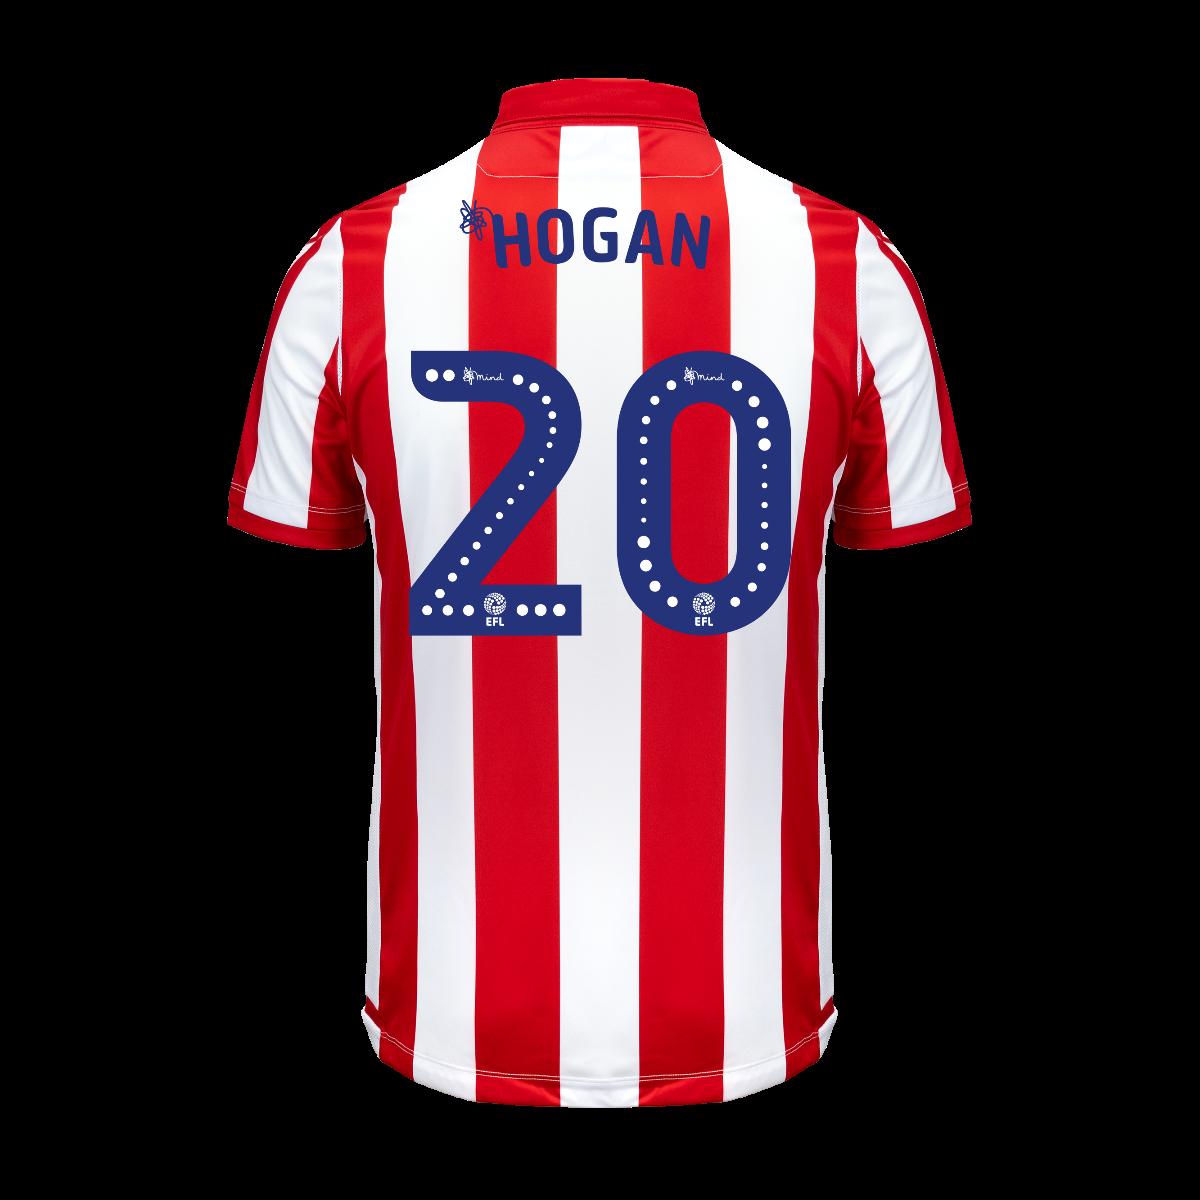 2019/20 Ladies Home Shirt - Hogan